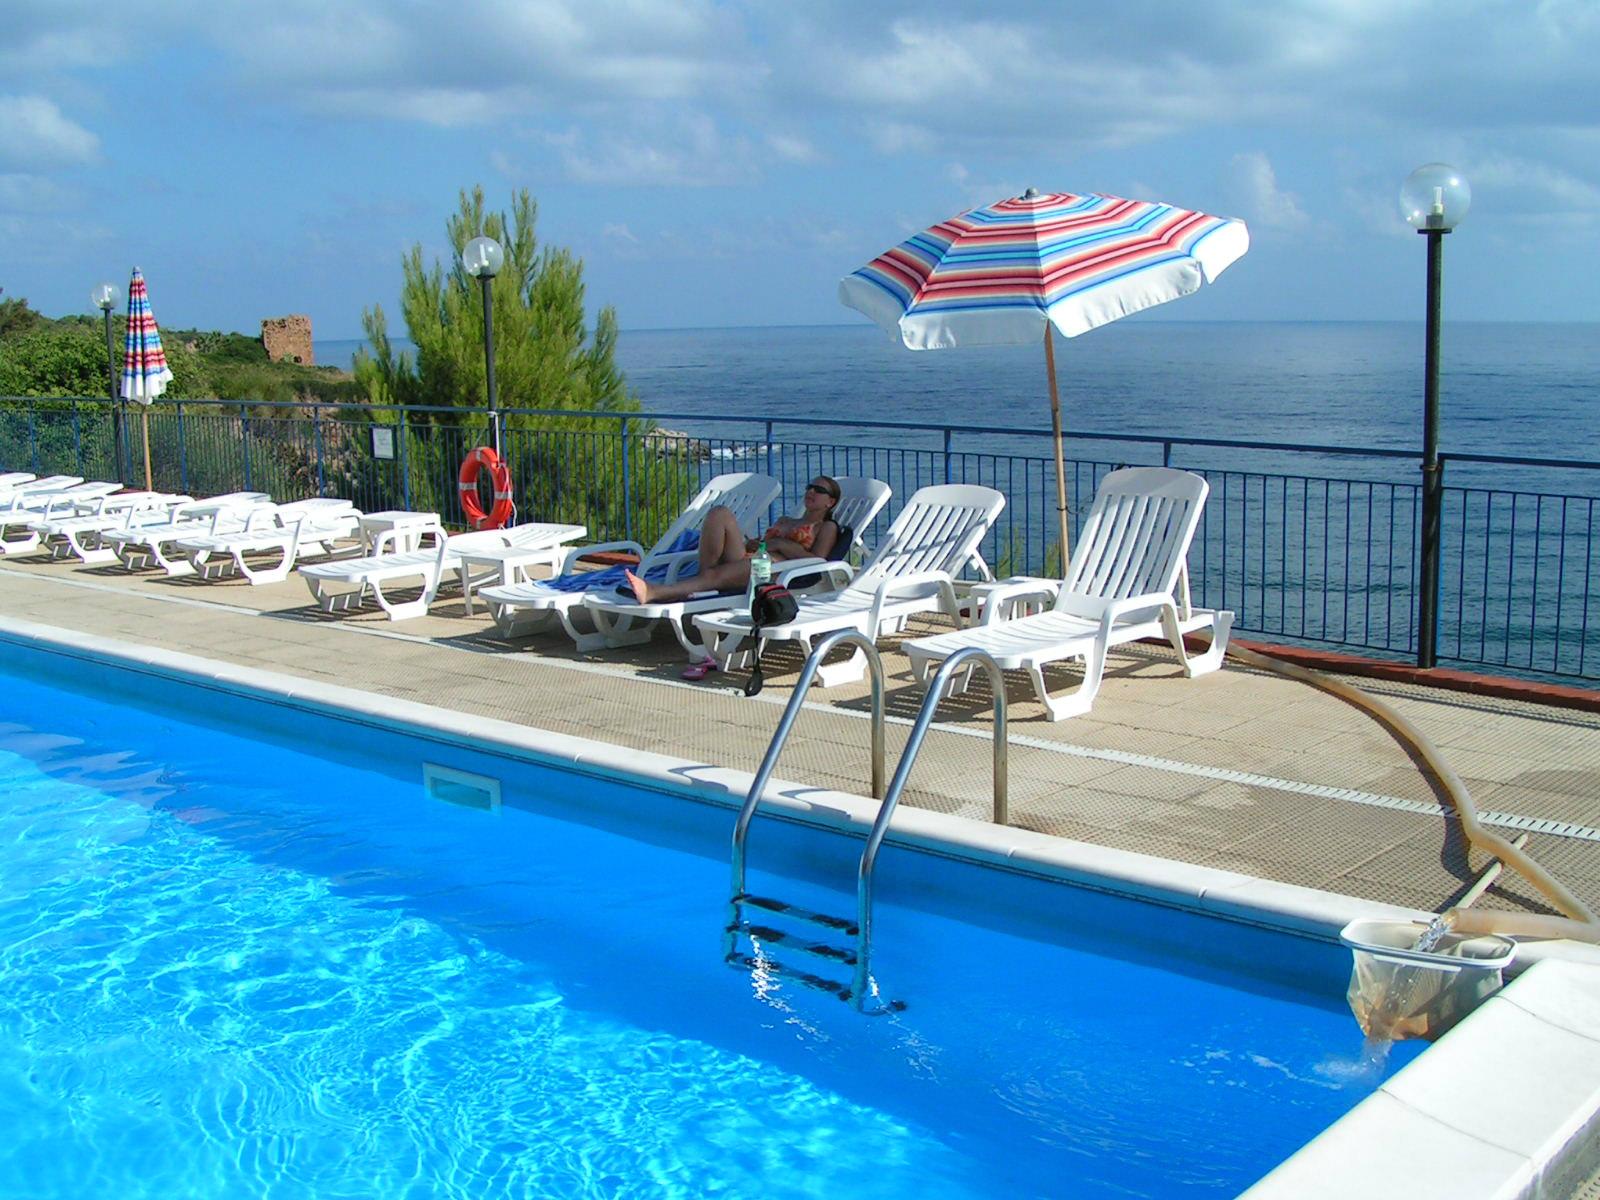 Great view, Sicily coast, Italy